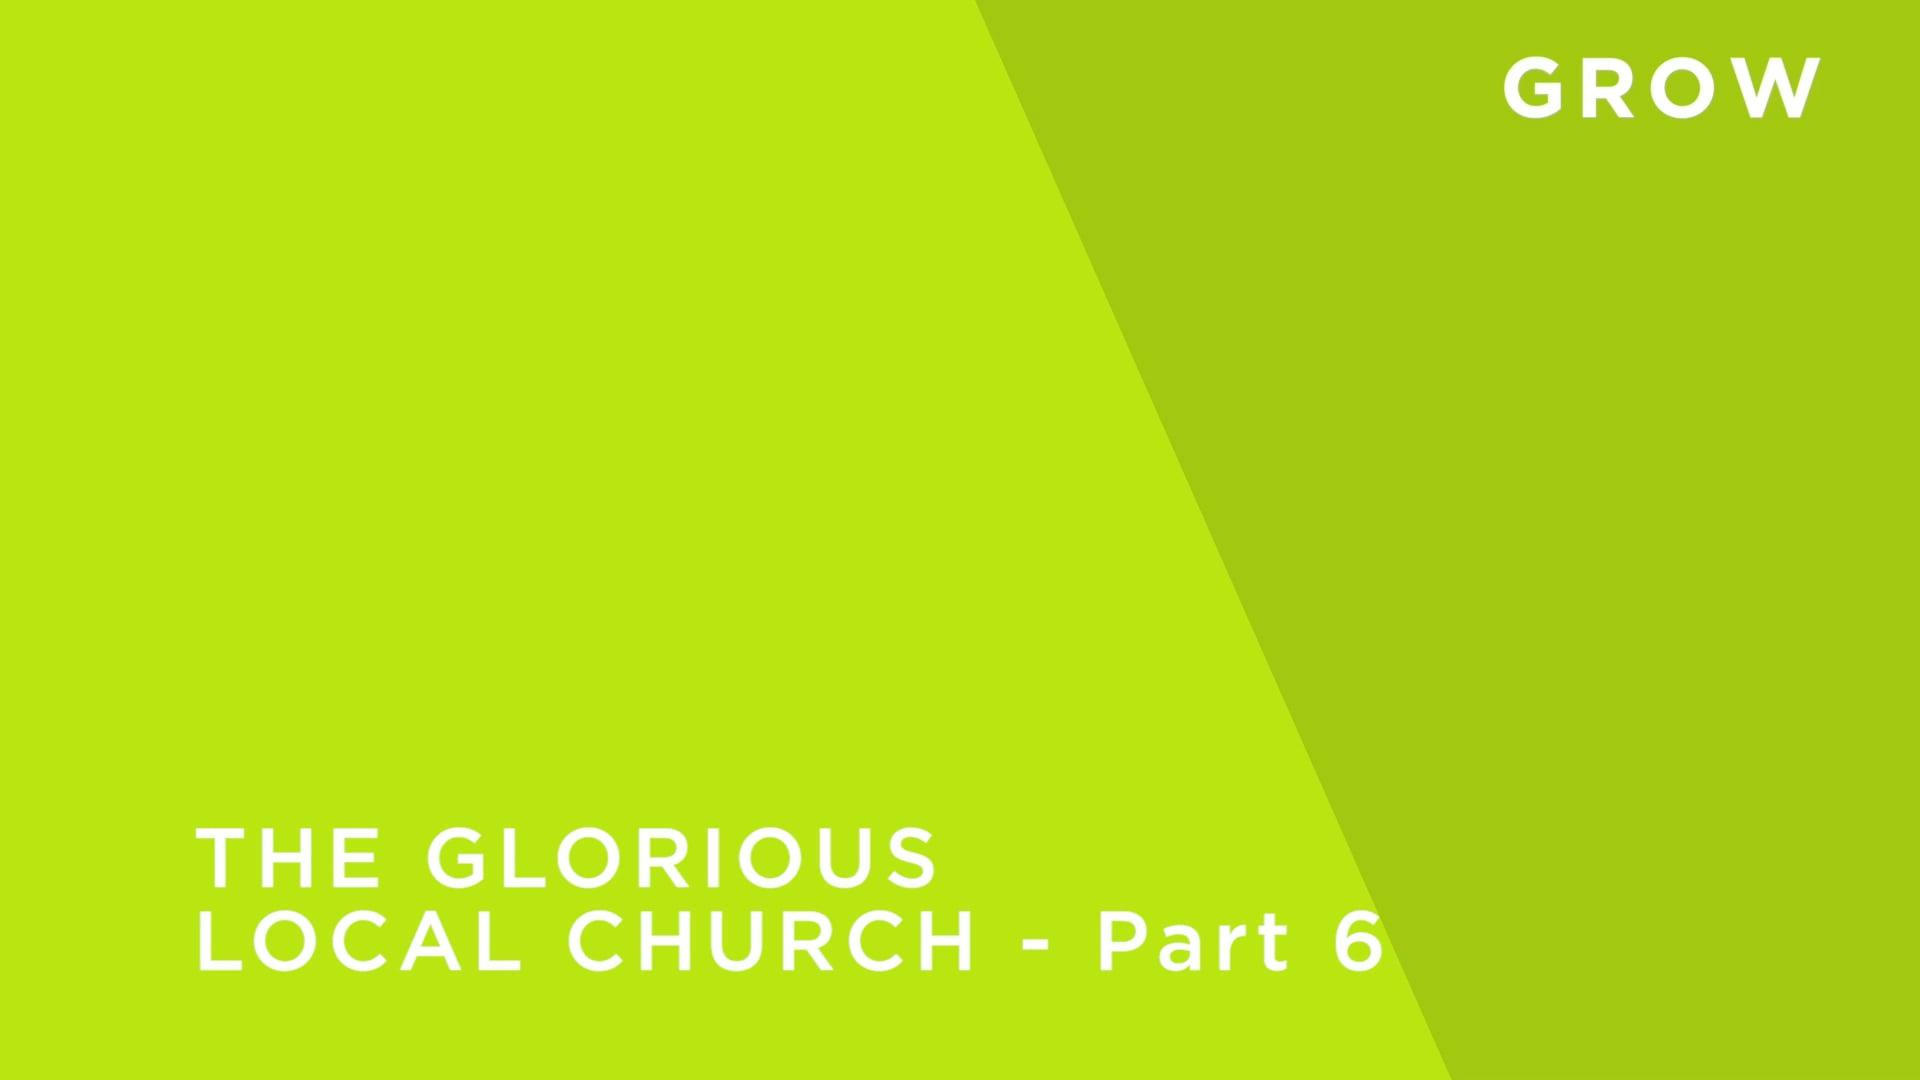 The Glorious Local Church - Part 6 - SHEEPFOLDS